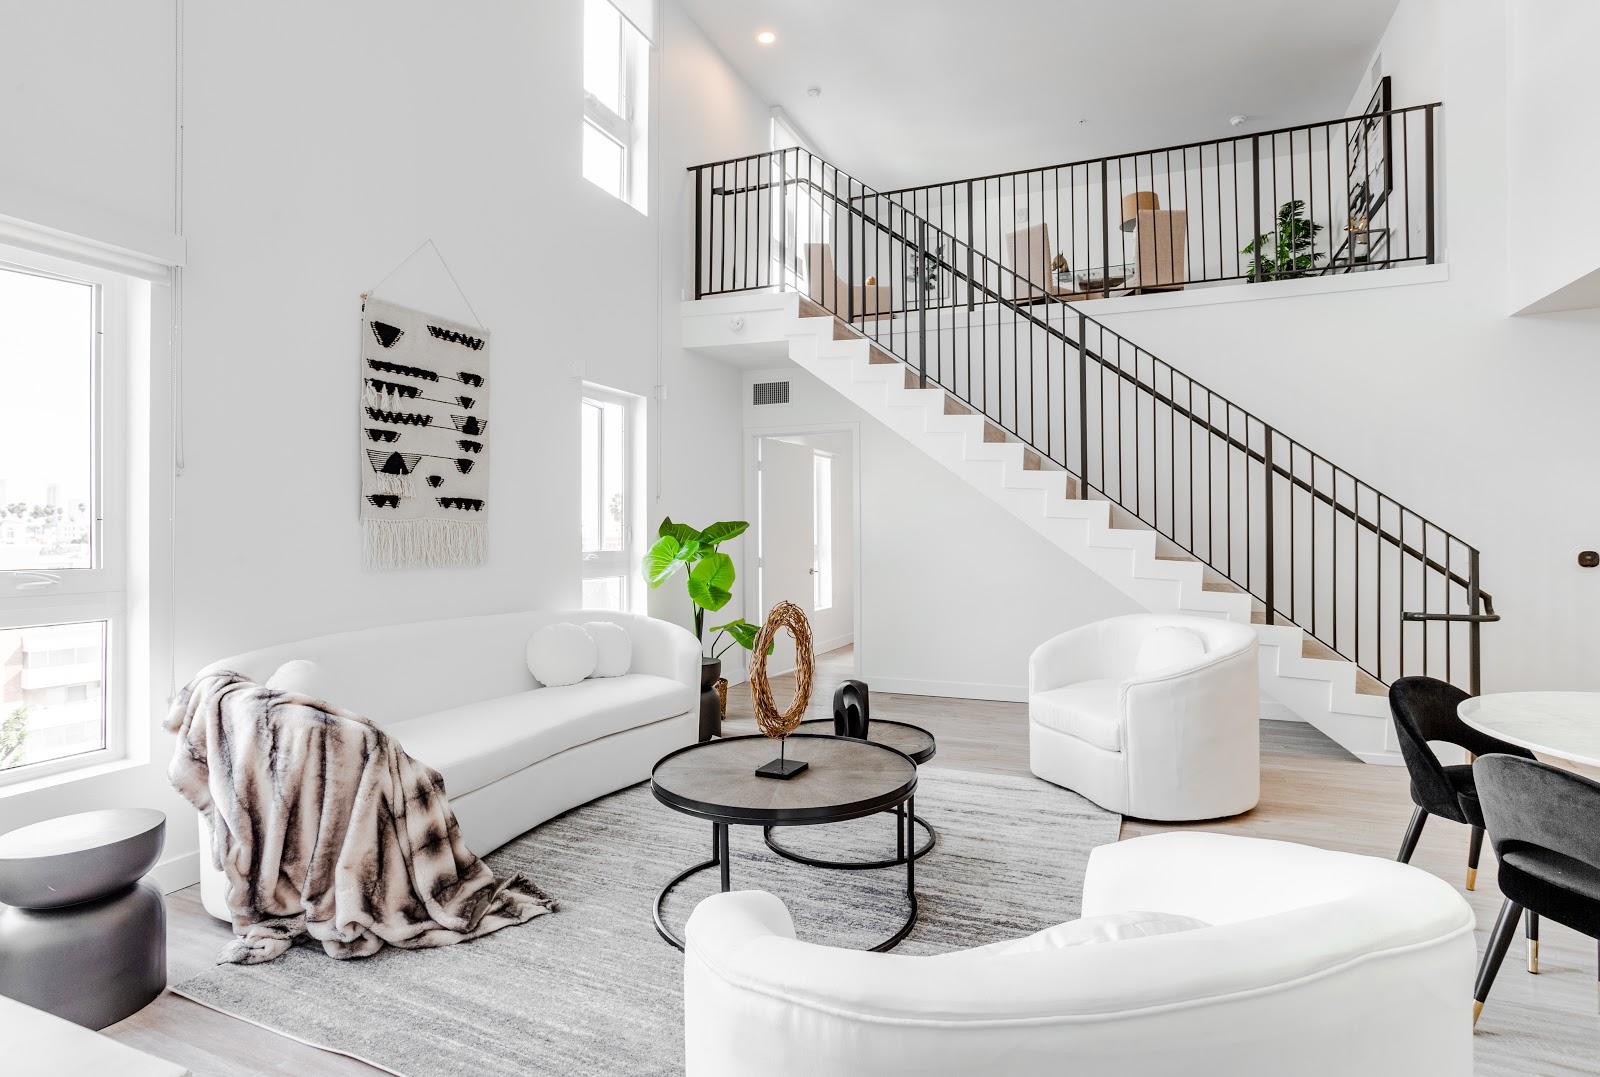 Tripalink The Harper luxury Apartment